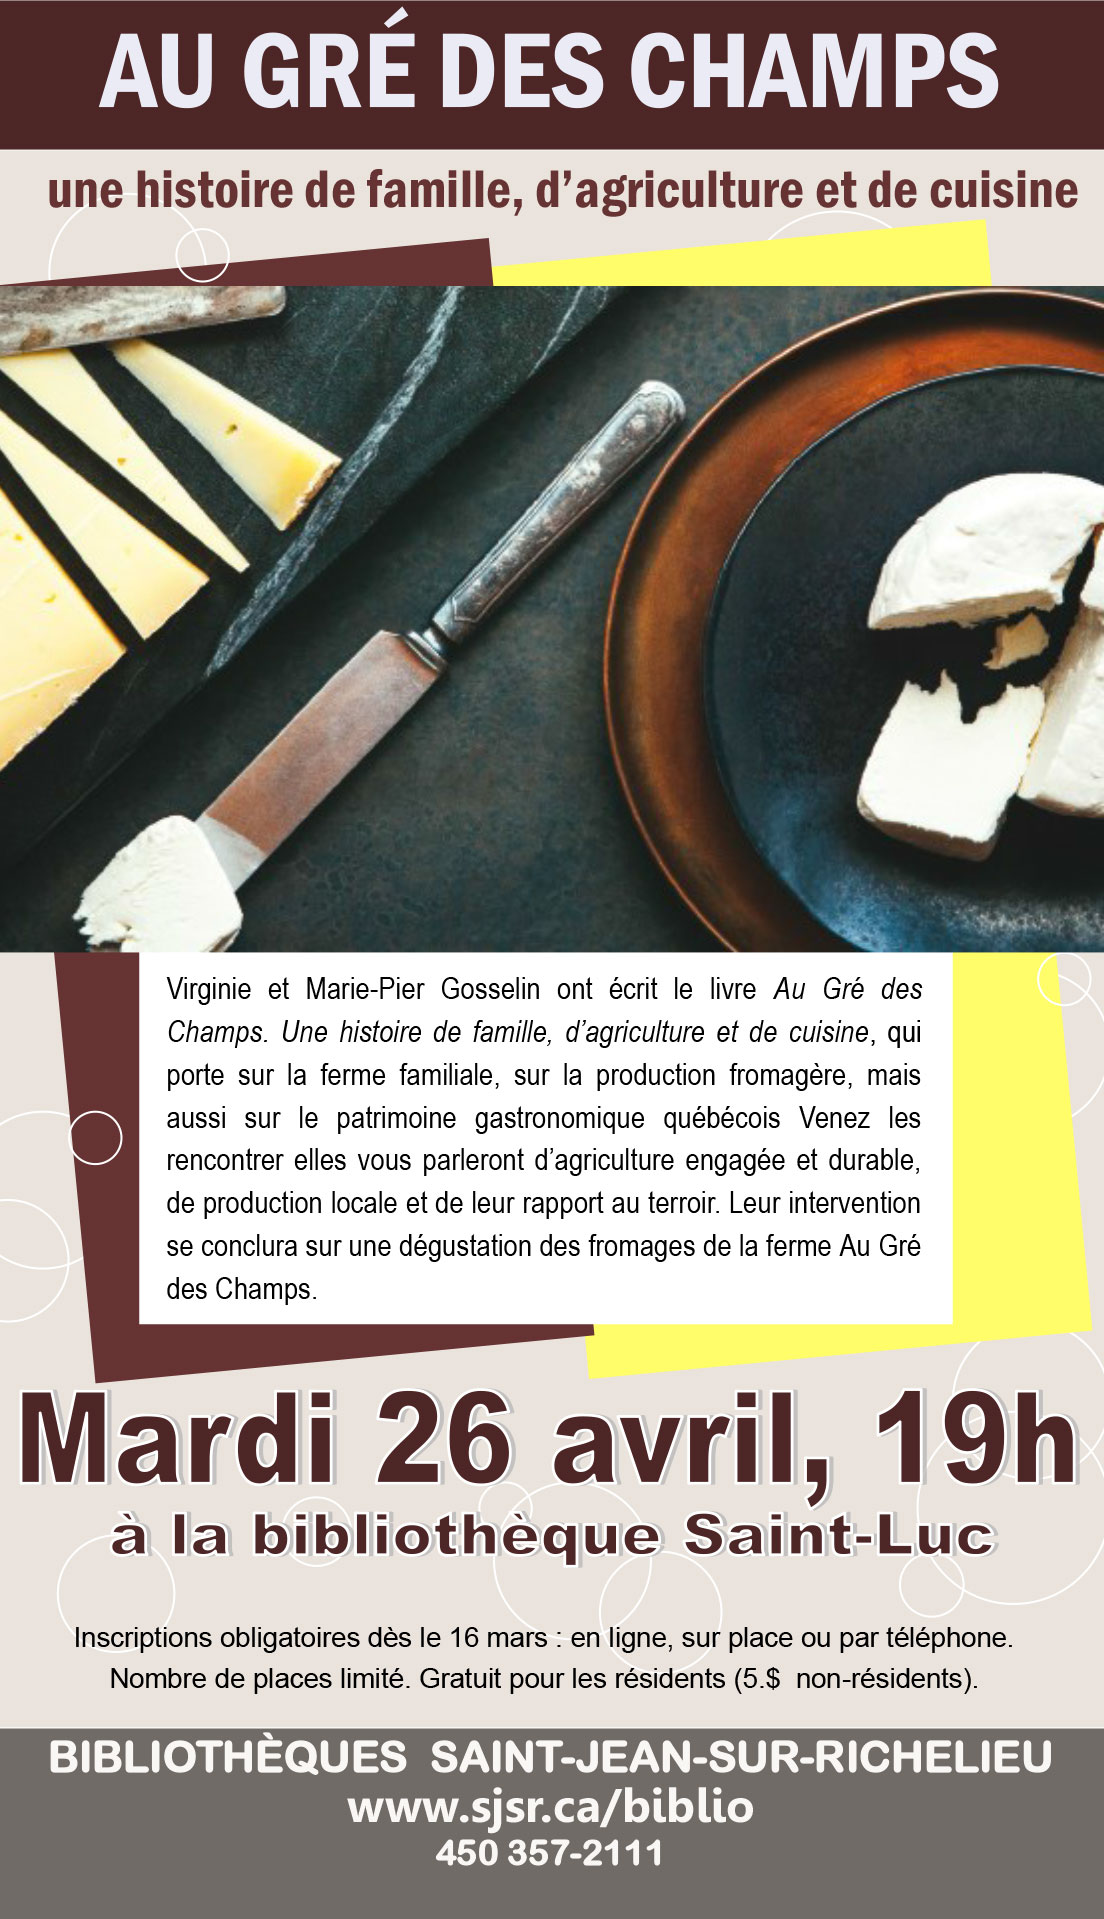 conference_virginie_marie-pier_gosselin_st-jean-sur-richelieu